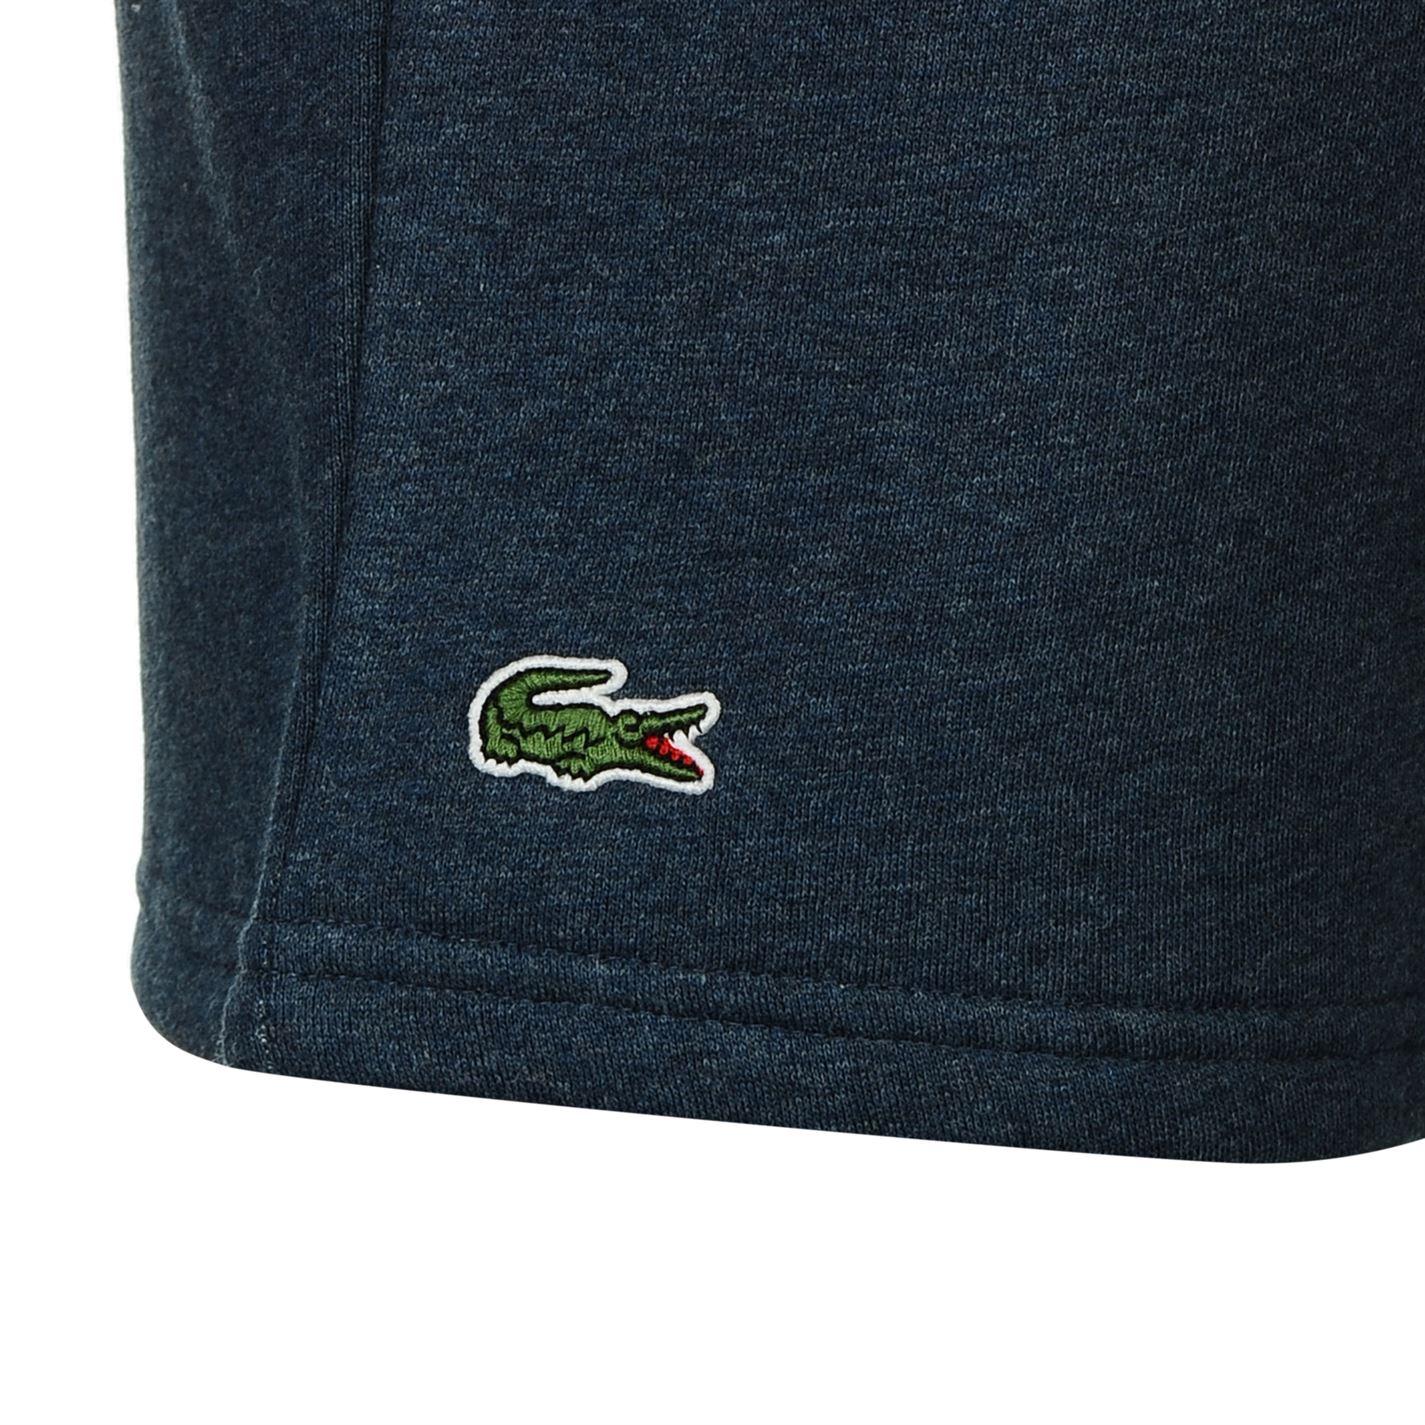 Lacoste-Fleece-Jogger-Shorts-Mens thumbnail 10